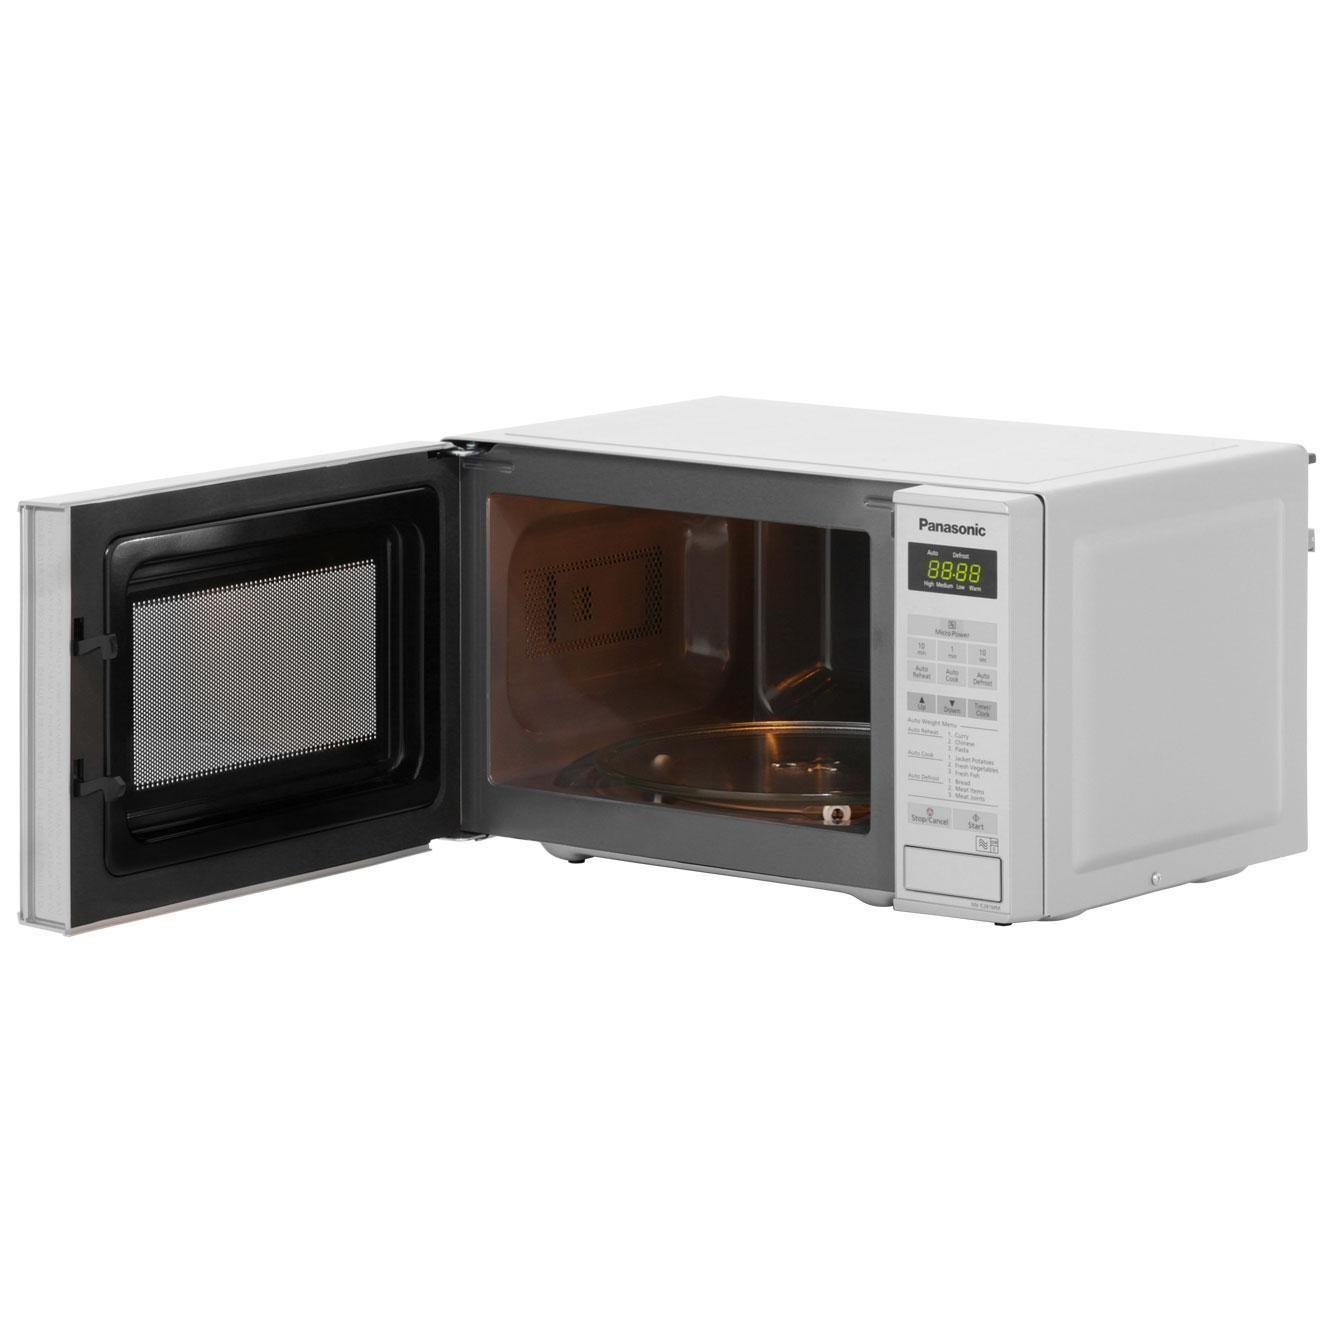 Panasonic Nn E281mmbpq 800w 20 Litre Microwave Oven